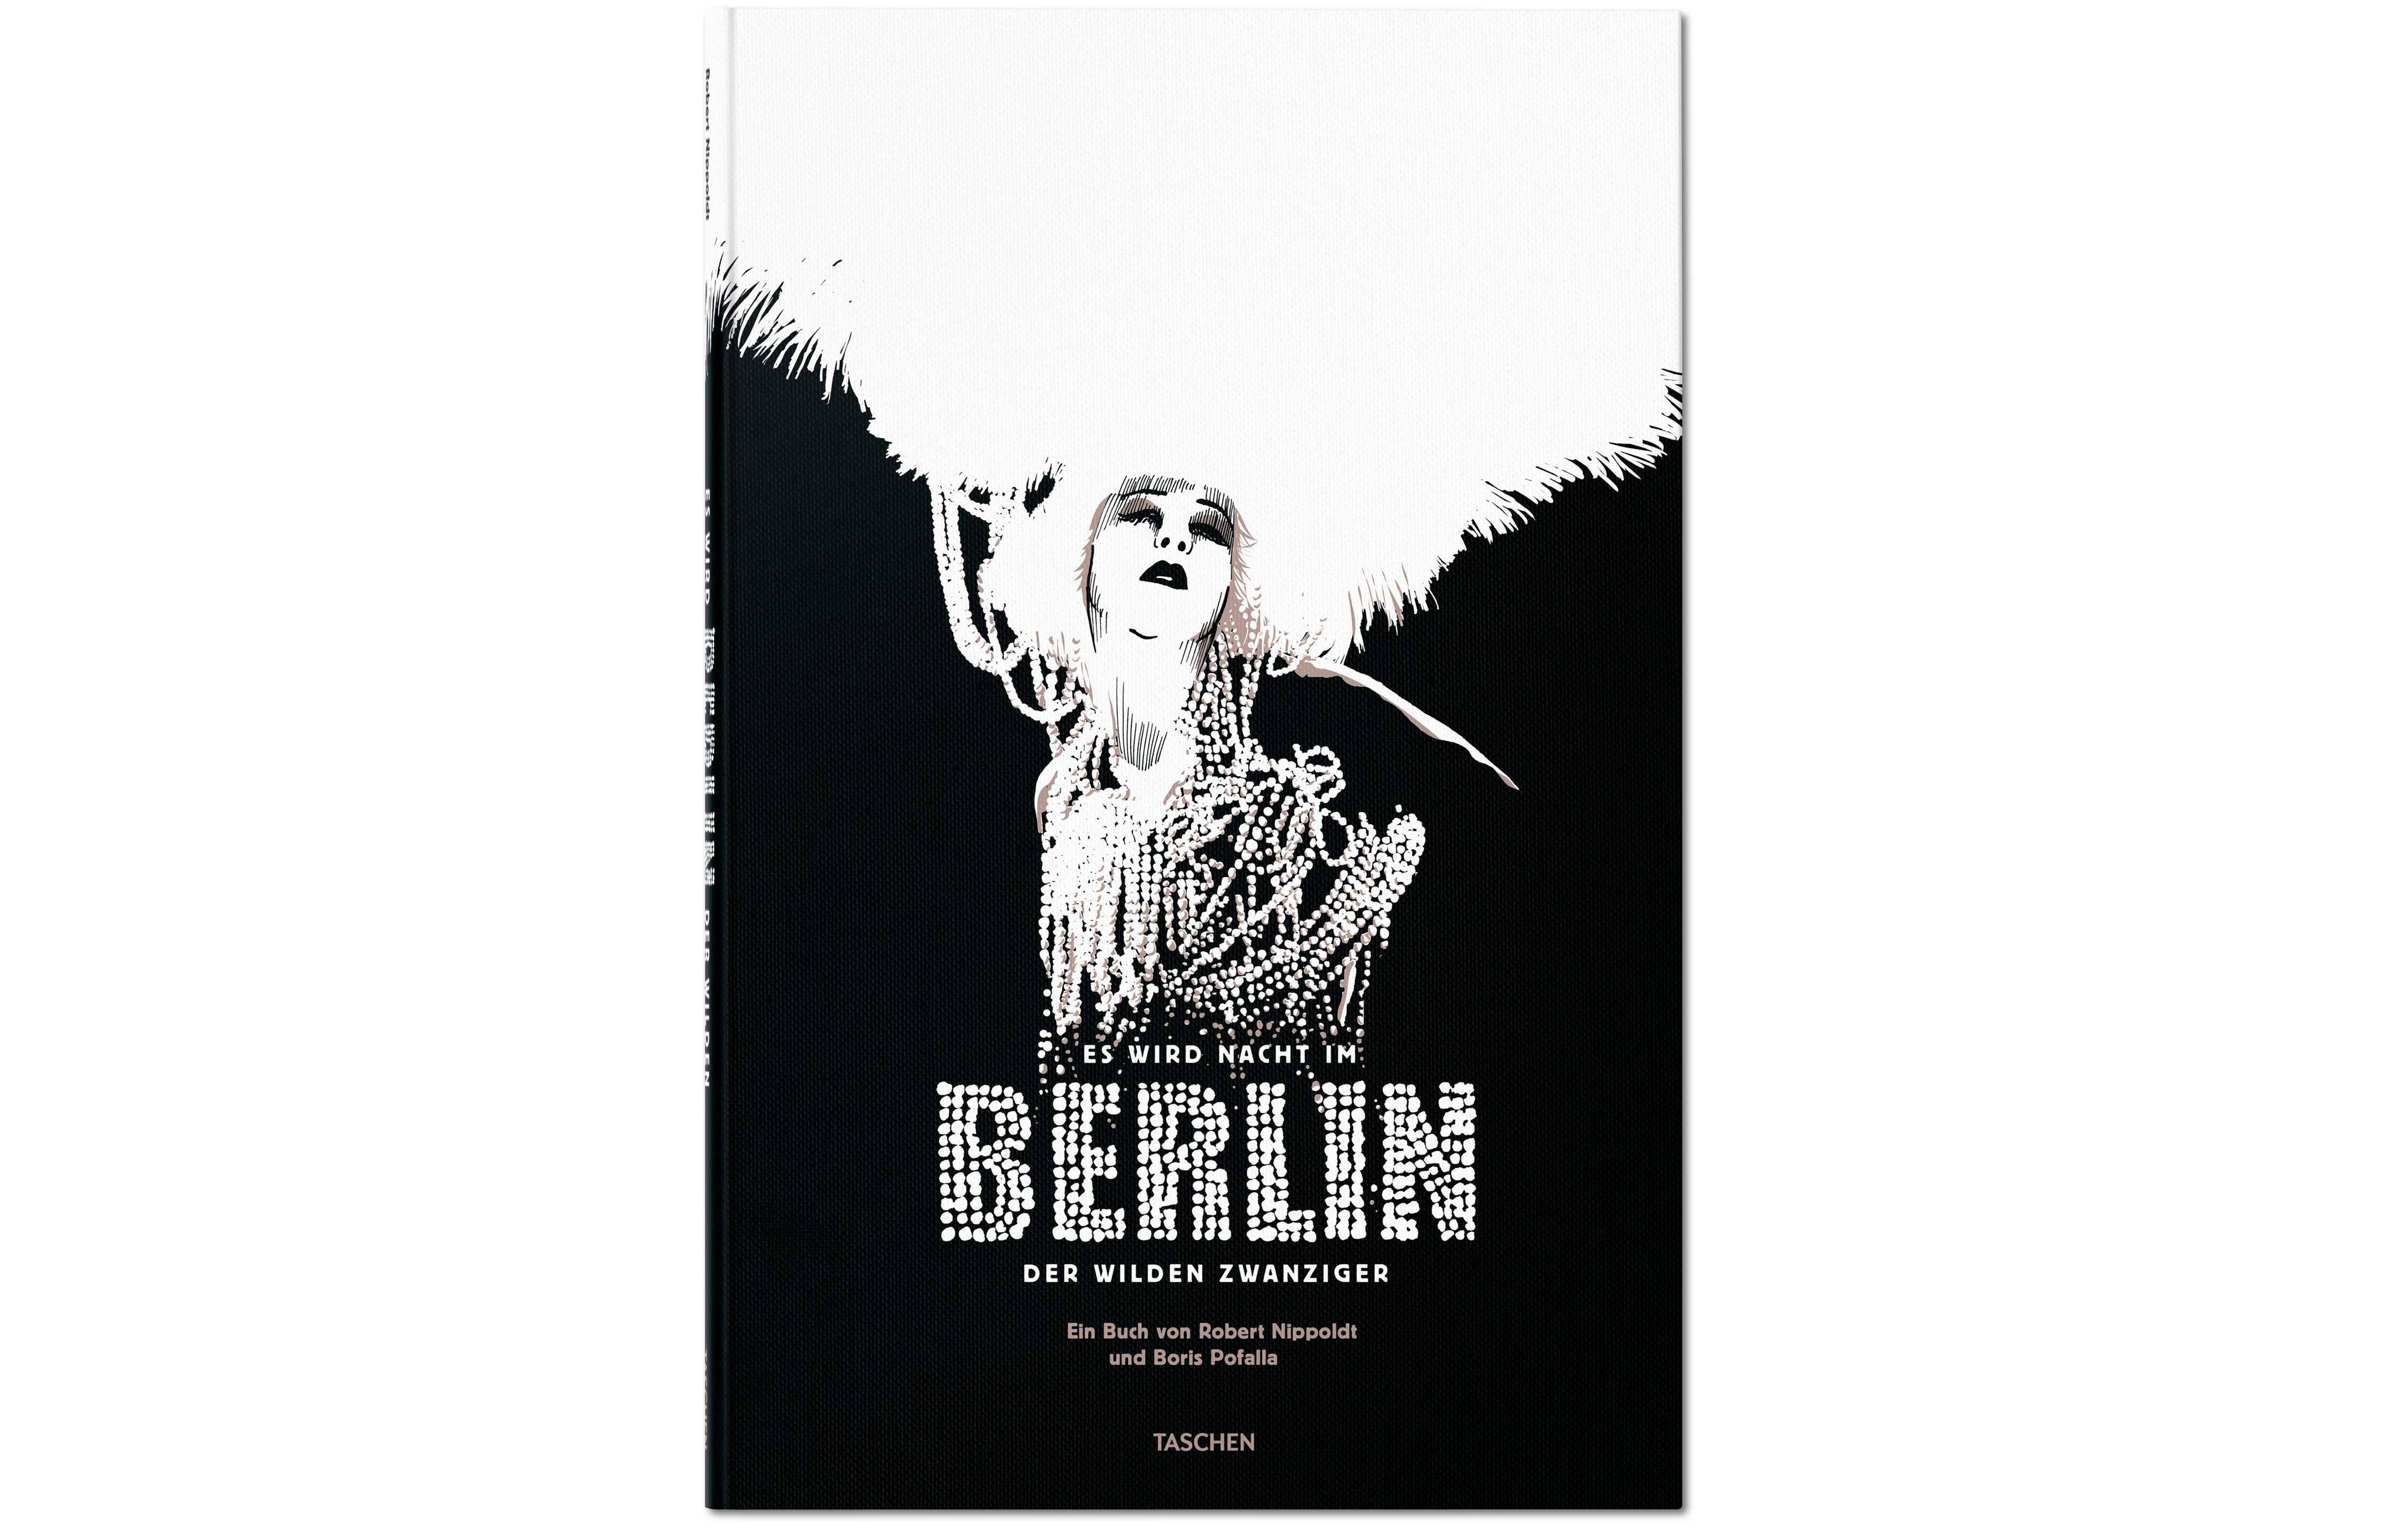 va_nippoldt_Berlin_Cover_01.jpg